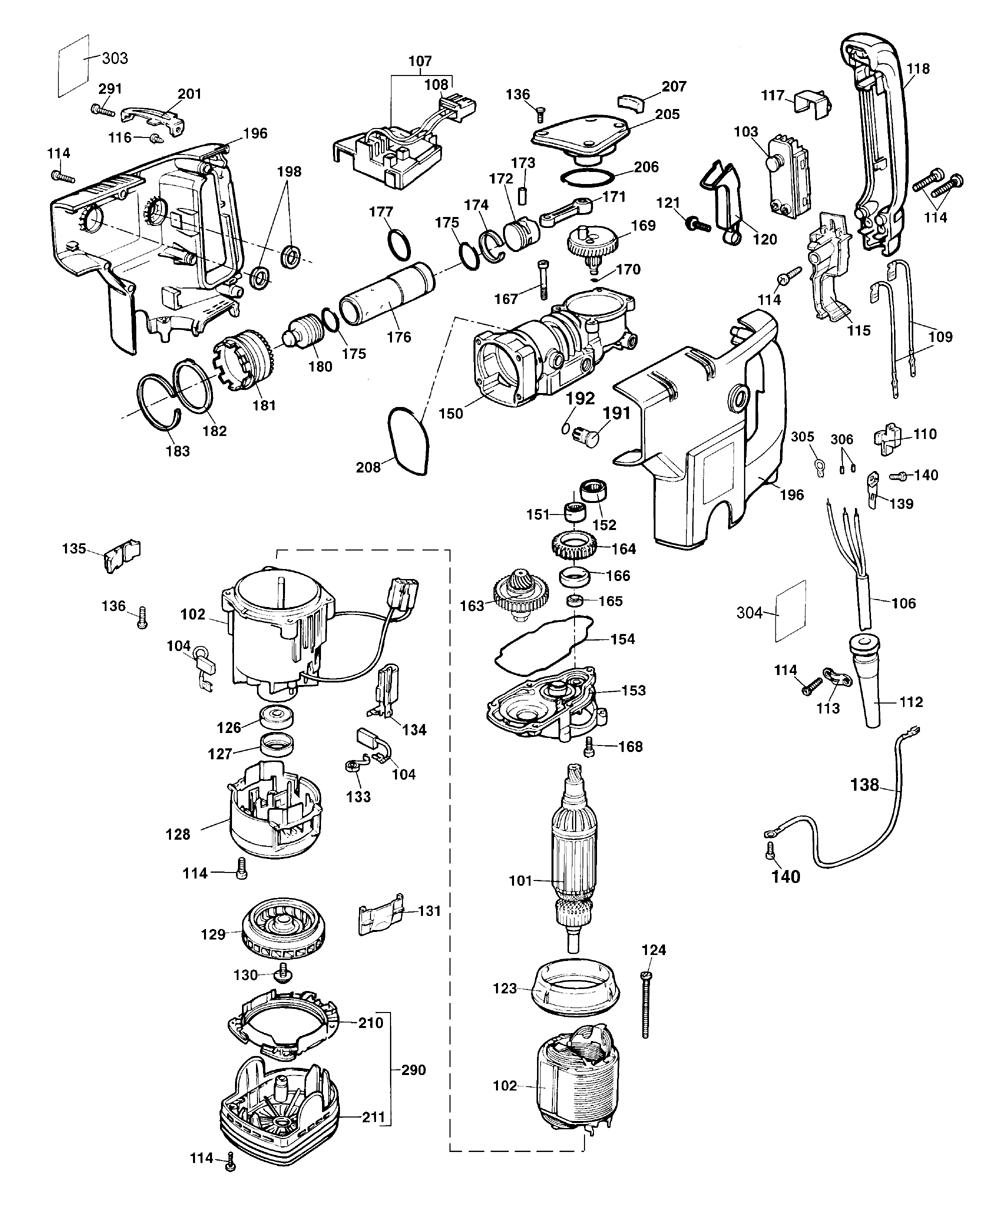 DW532K-Dewalt-T103-PB-1Break Down